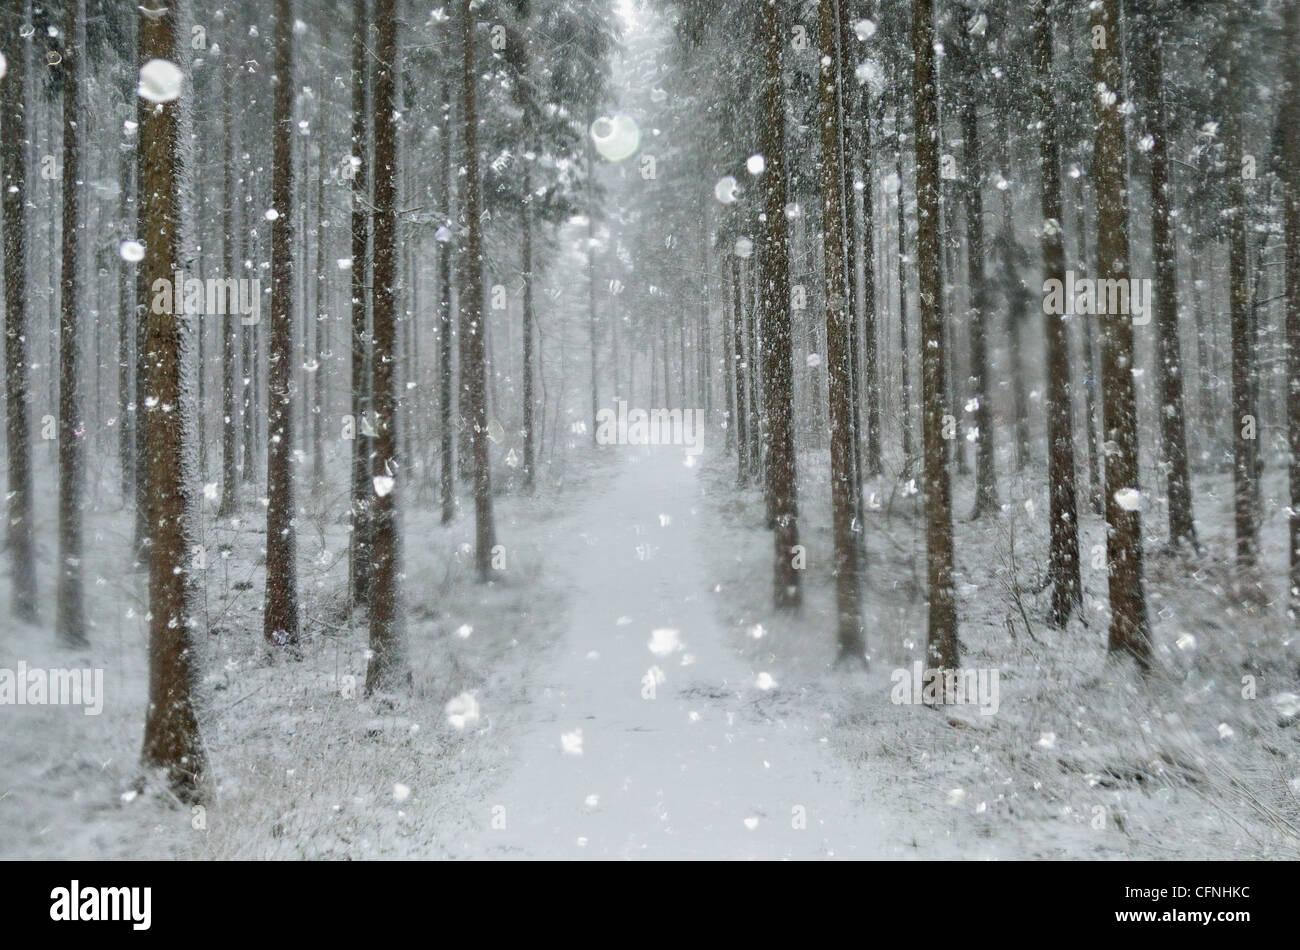 Paisaje invernal, cerca de Villingen-Schwenningen, Selva Negra, Baden-Wurttemberg, Alemania, Europa Imagen De Stock